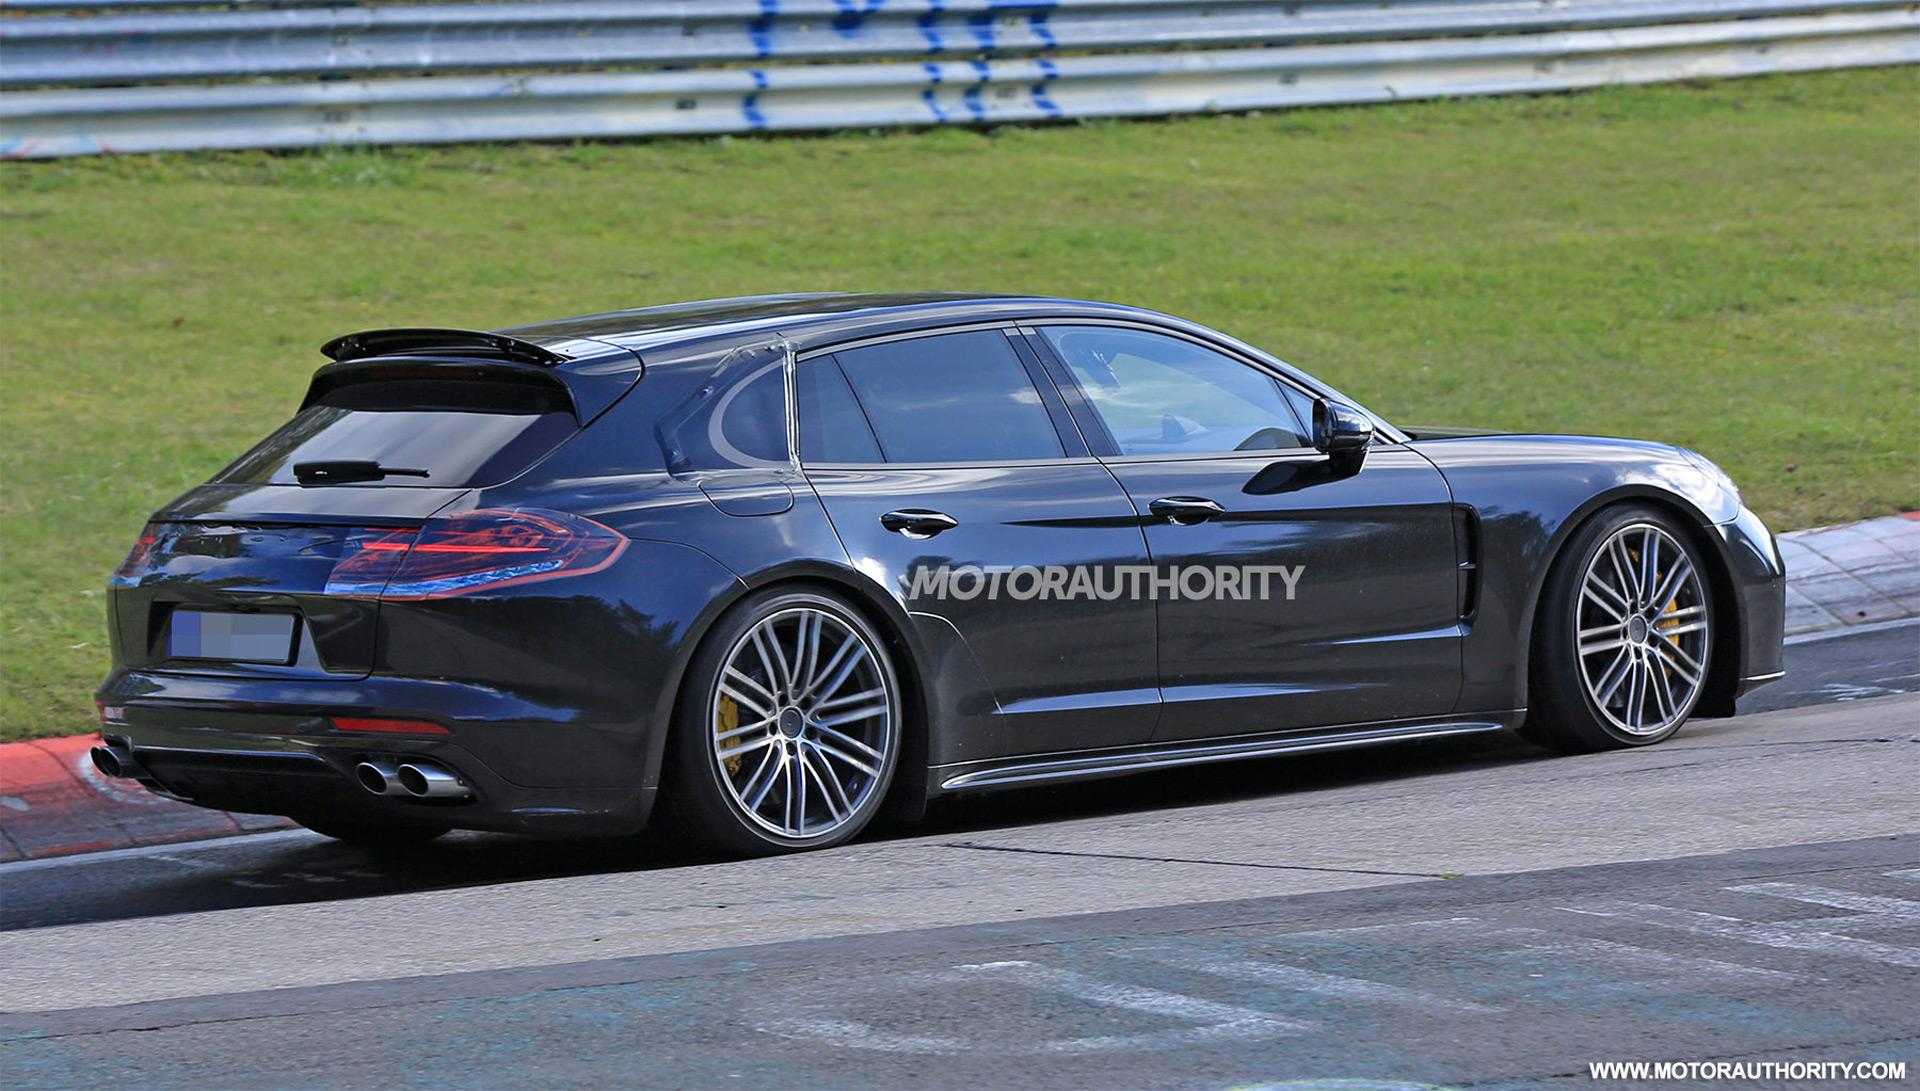 2018 Porsche Panamera Shooting Brake Spy Shots